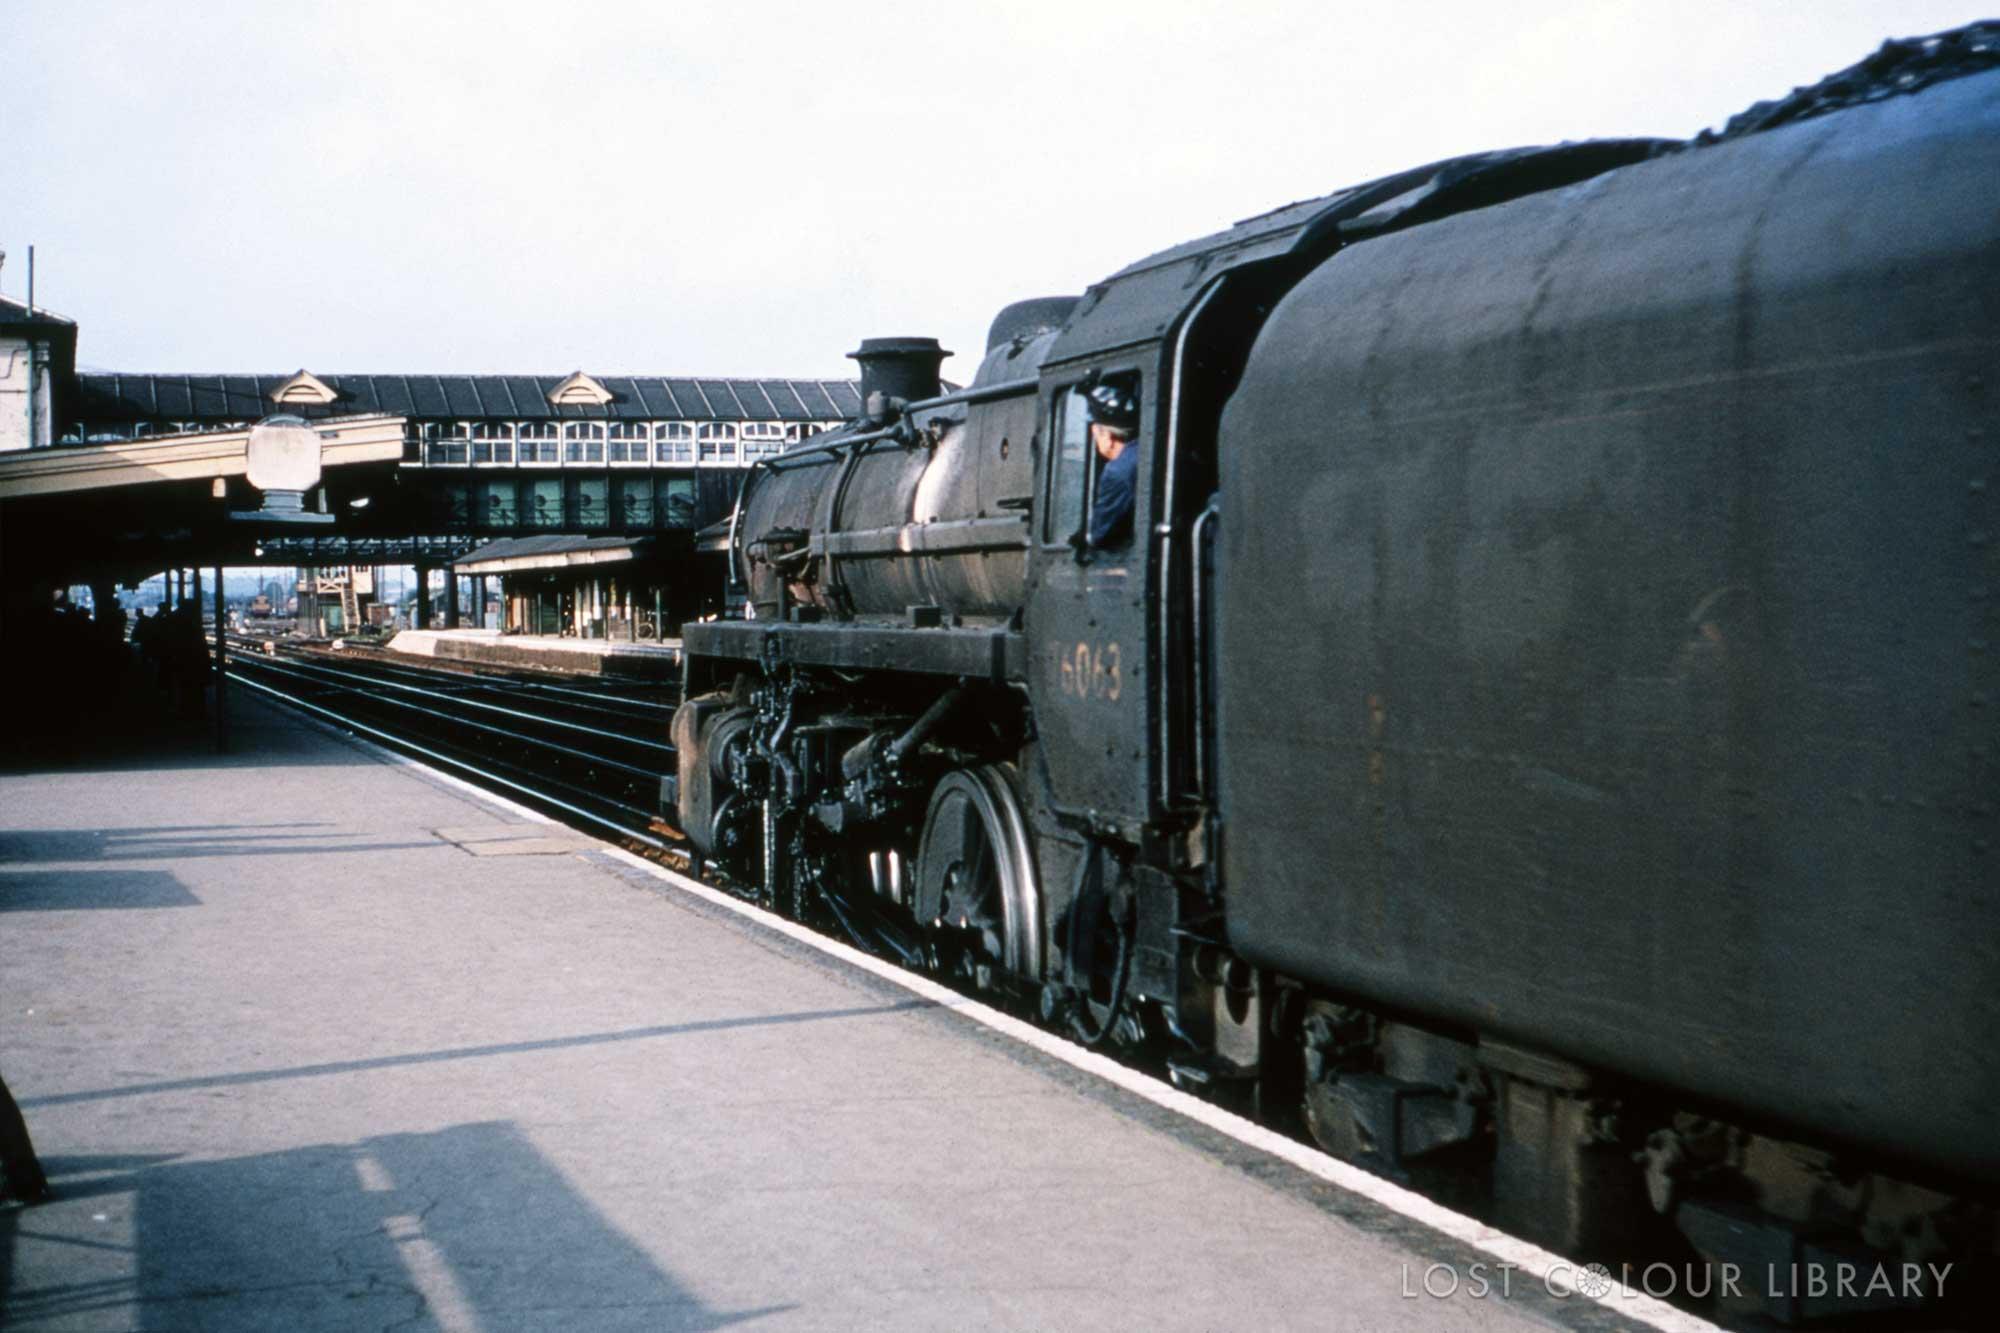 lcl-ww-locomotive-eastleigh-1960s-site-wm.jpg